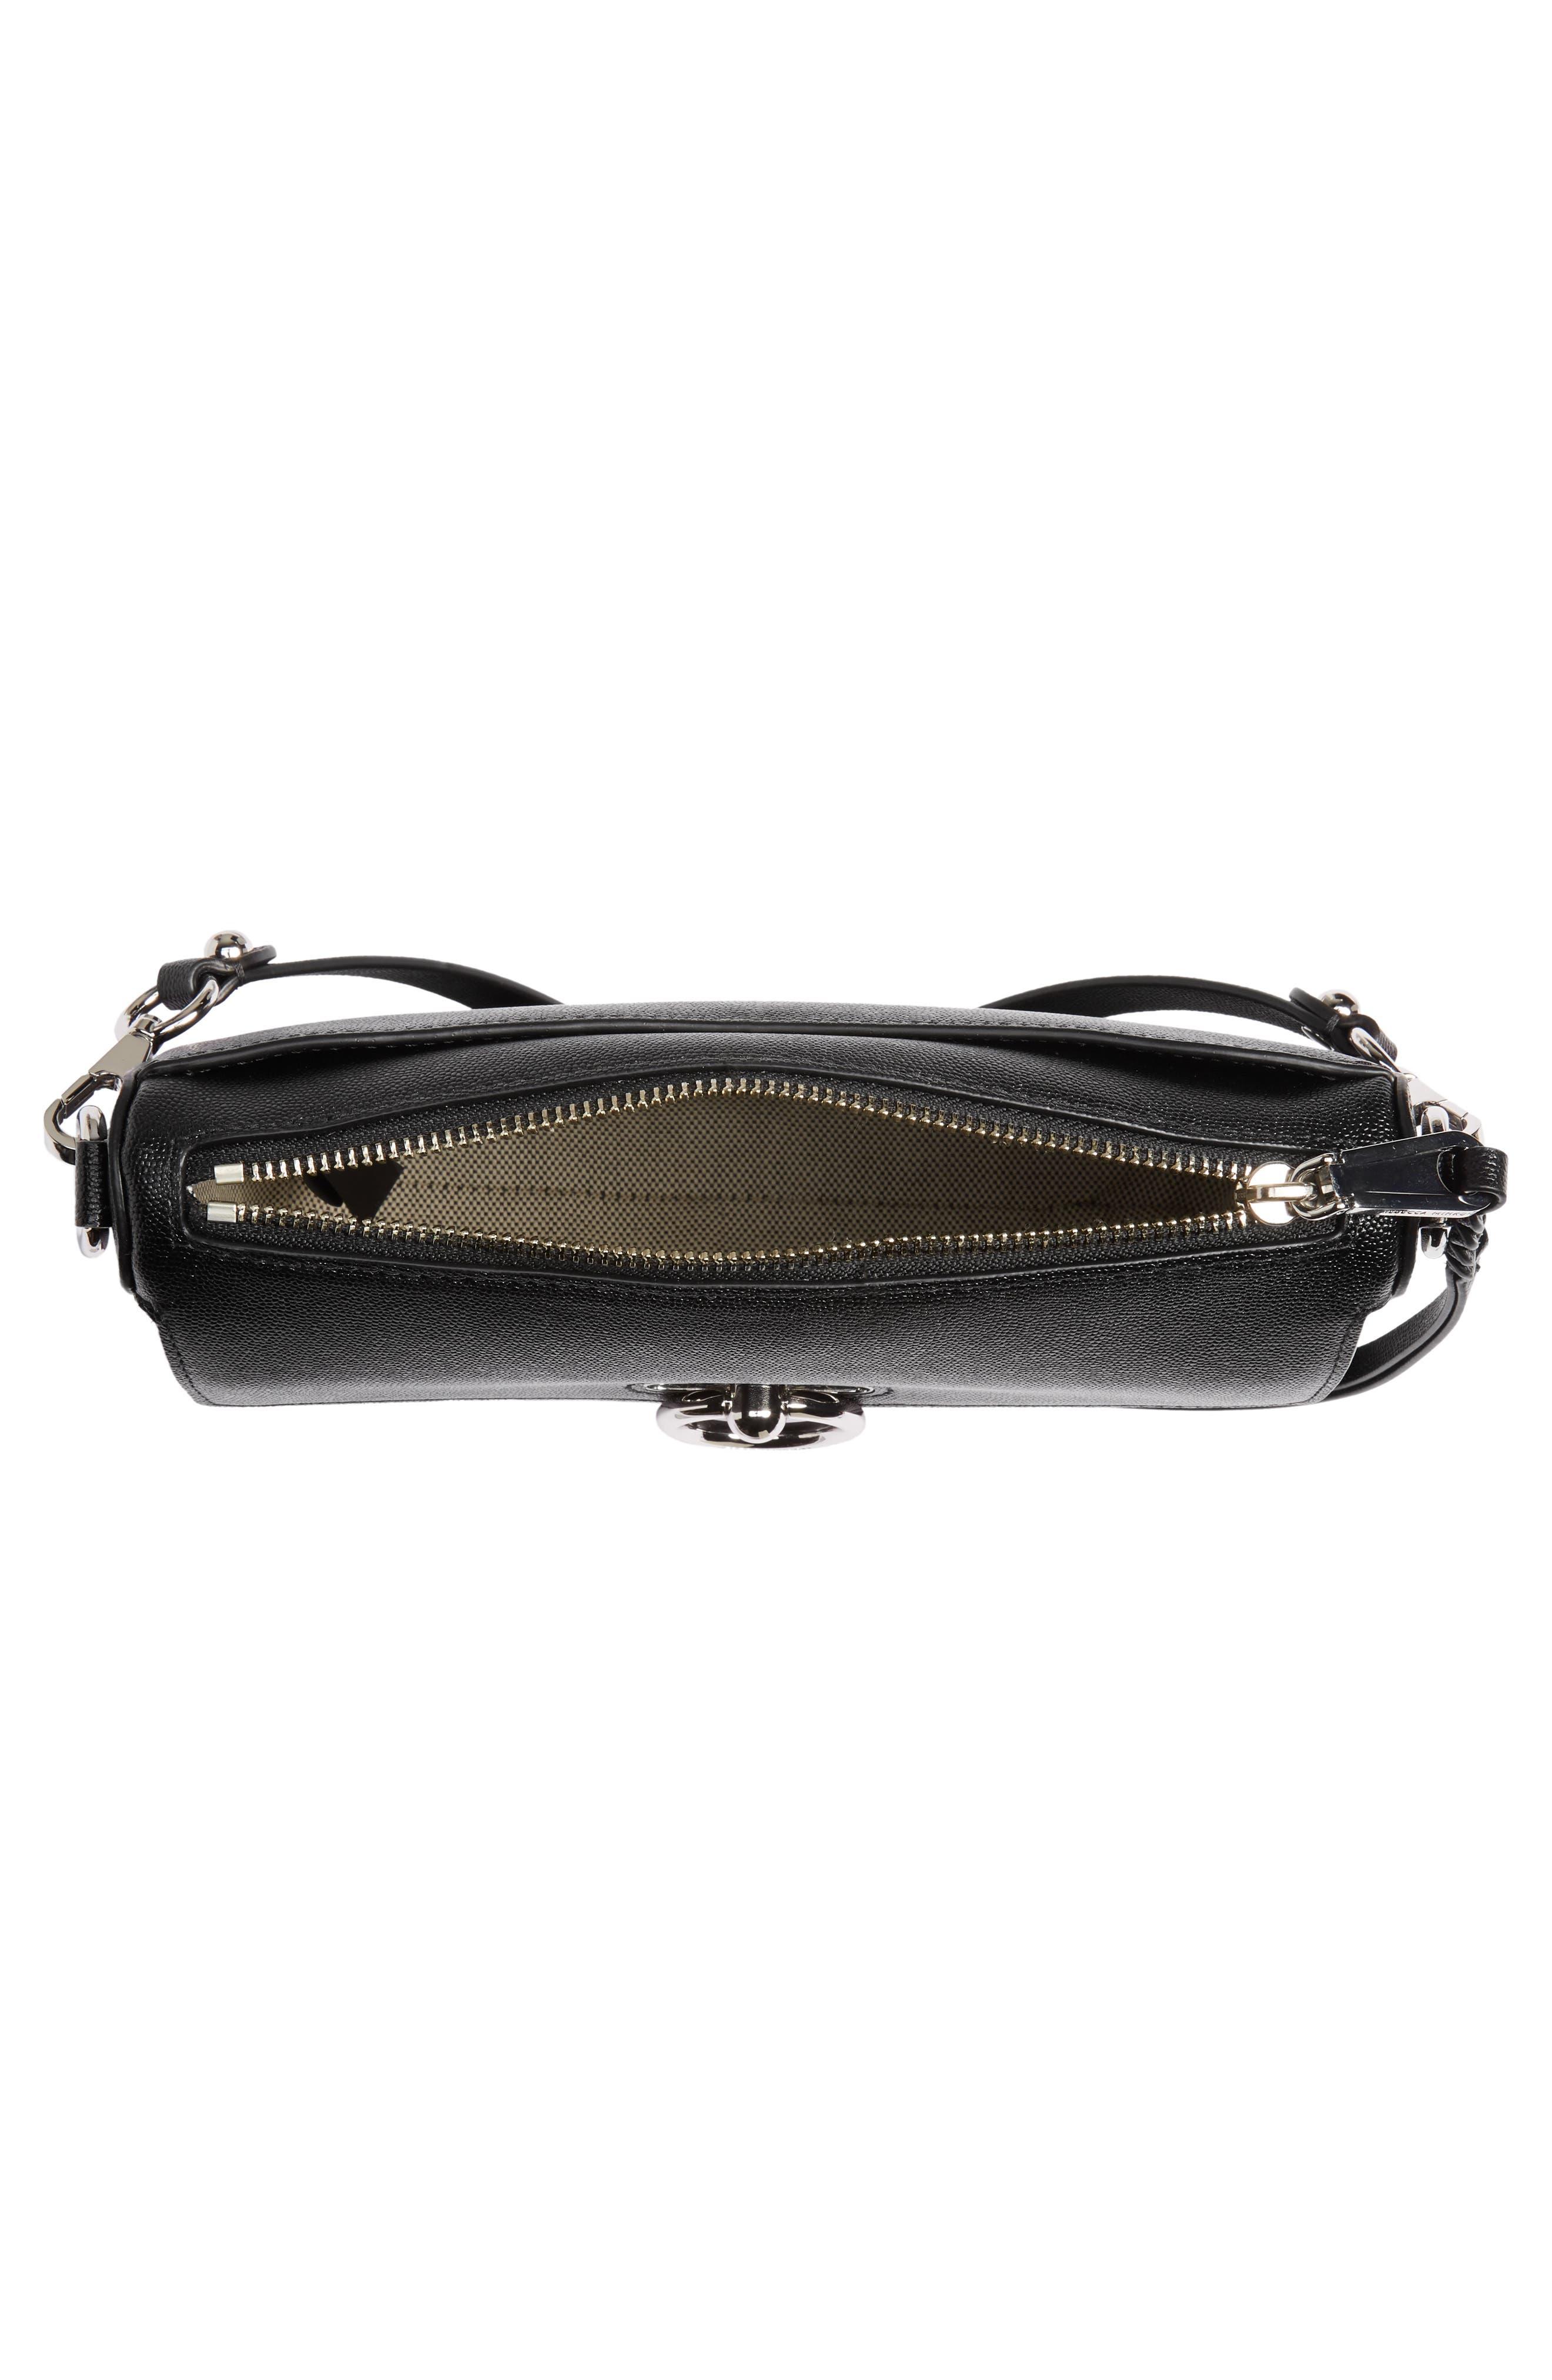 Jean MAC Convertible Crossbody Bag,                             Alternate thumbnail 4, color,                             BLACK